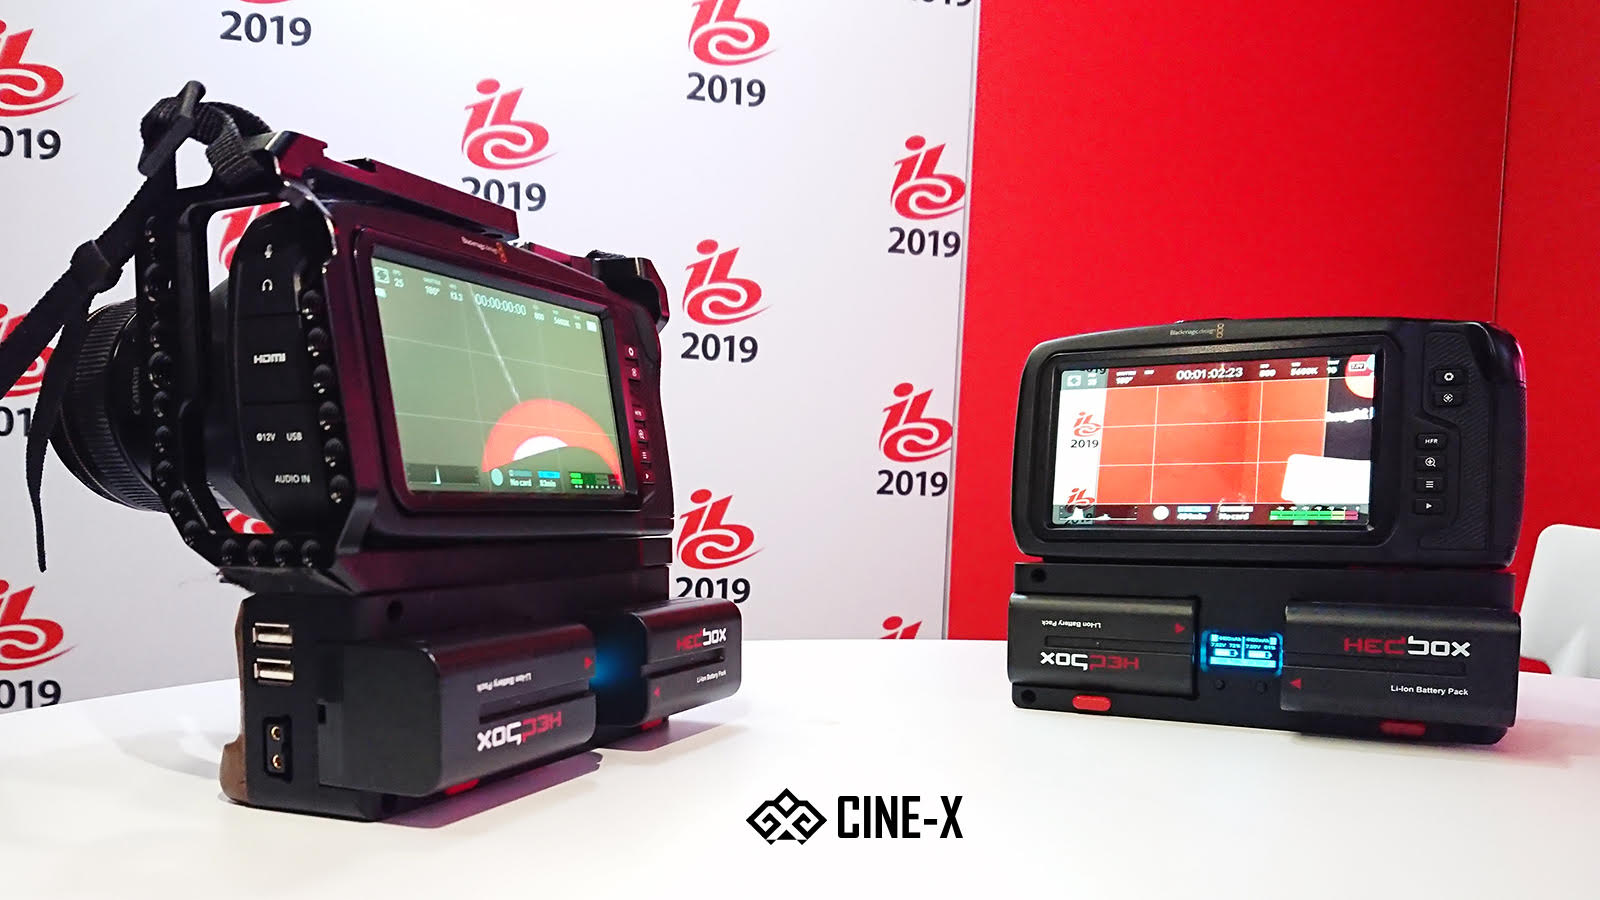 CINE-X Battery grip for the BMPCC 6K & 4K